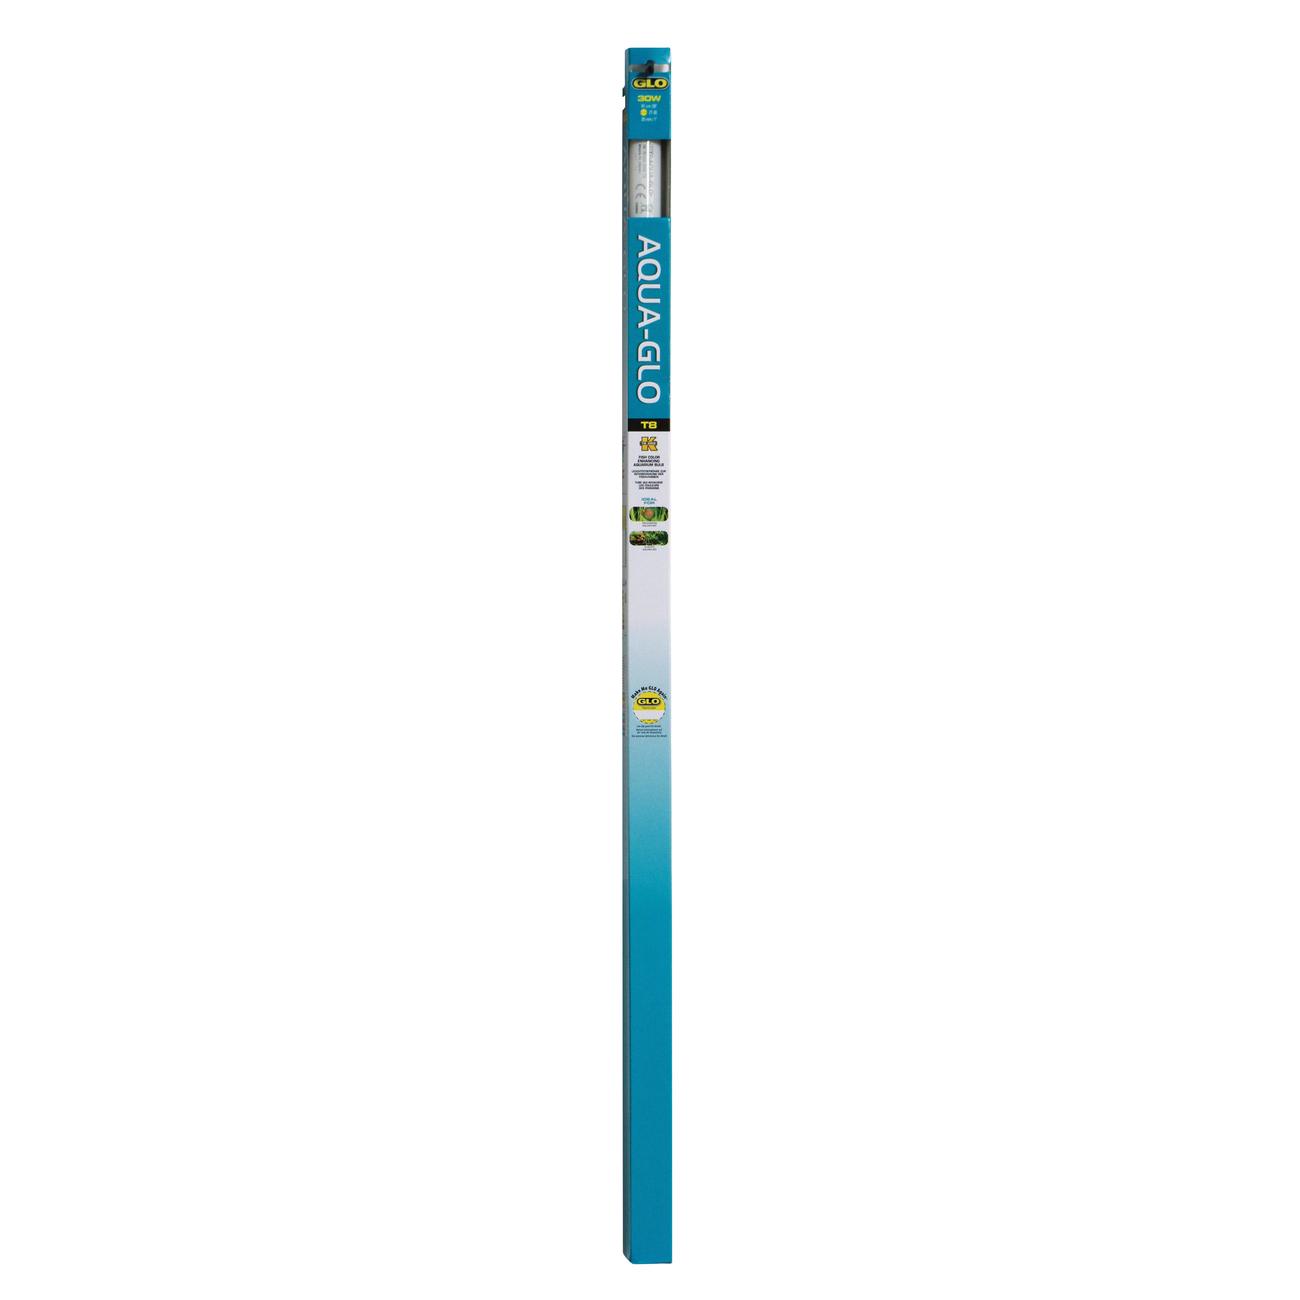 Hagen GLO Aqua-Glo Leuchtstoffröhre, 30 W - 2,6 x 91,0 x 2,6 cm